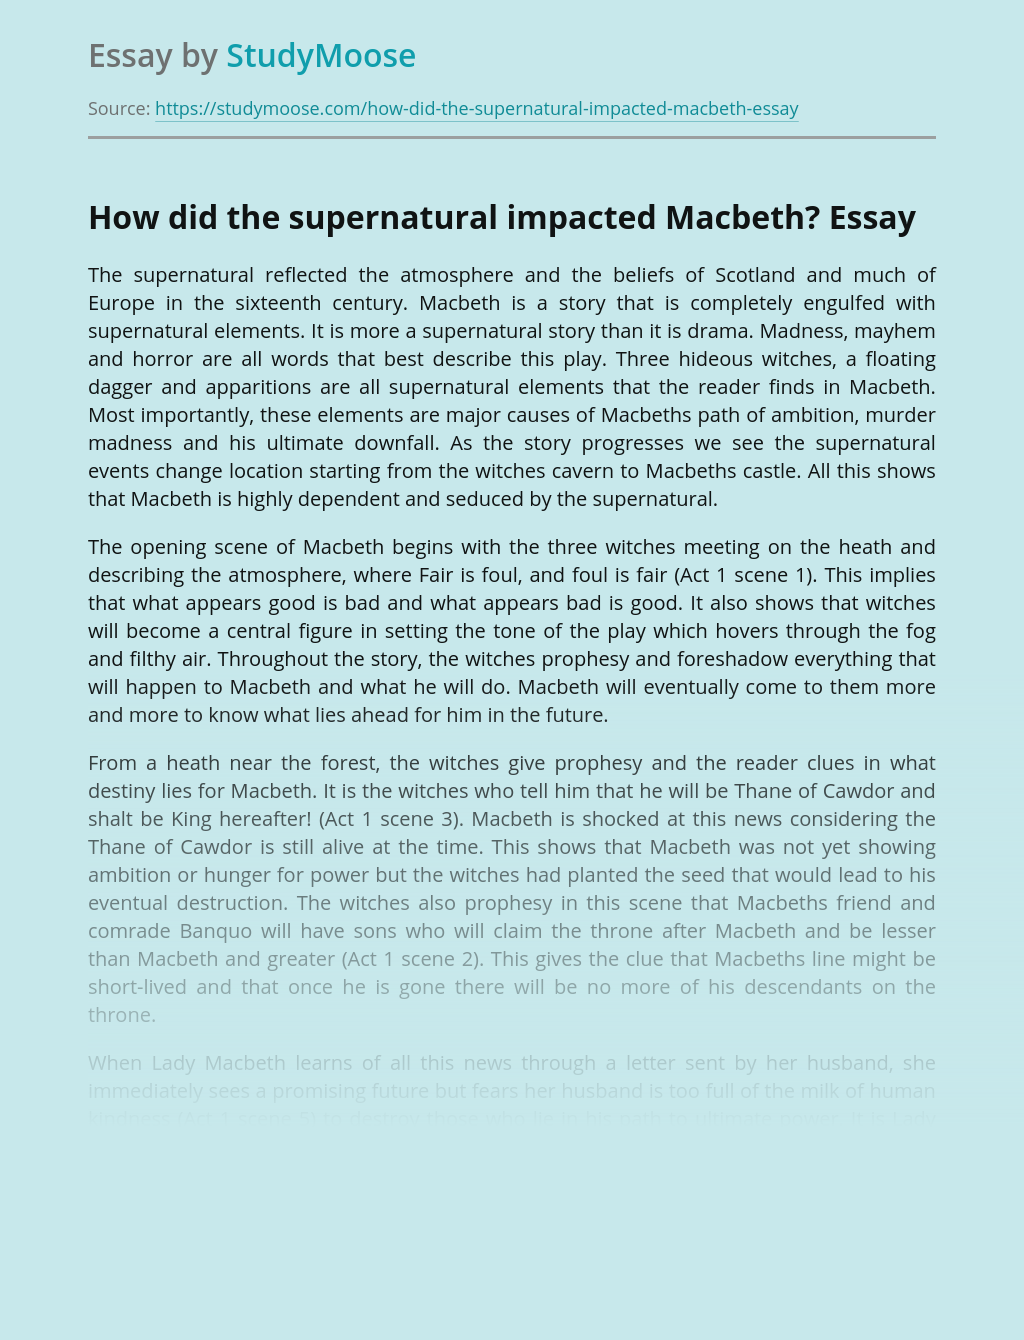 How did the supernatural impacted Macbeth?